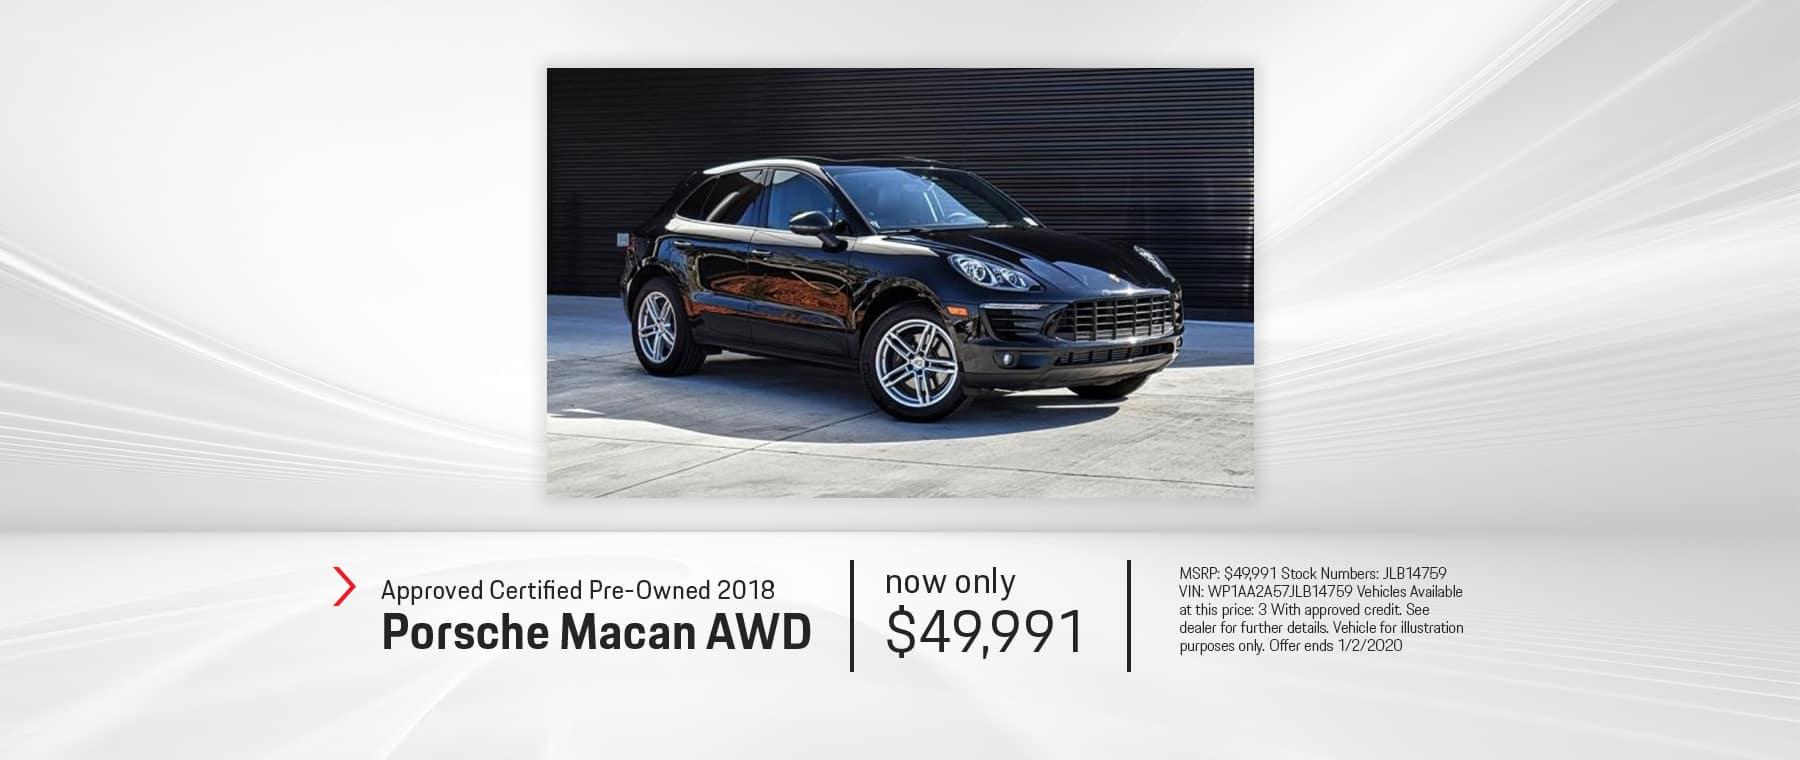 2018 MACAN AWD CPO $49,991